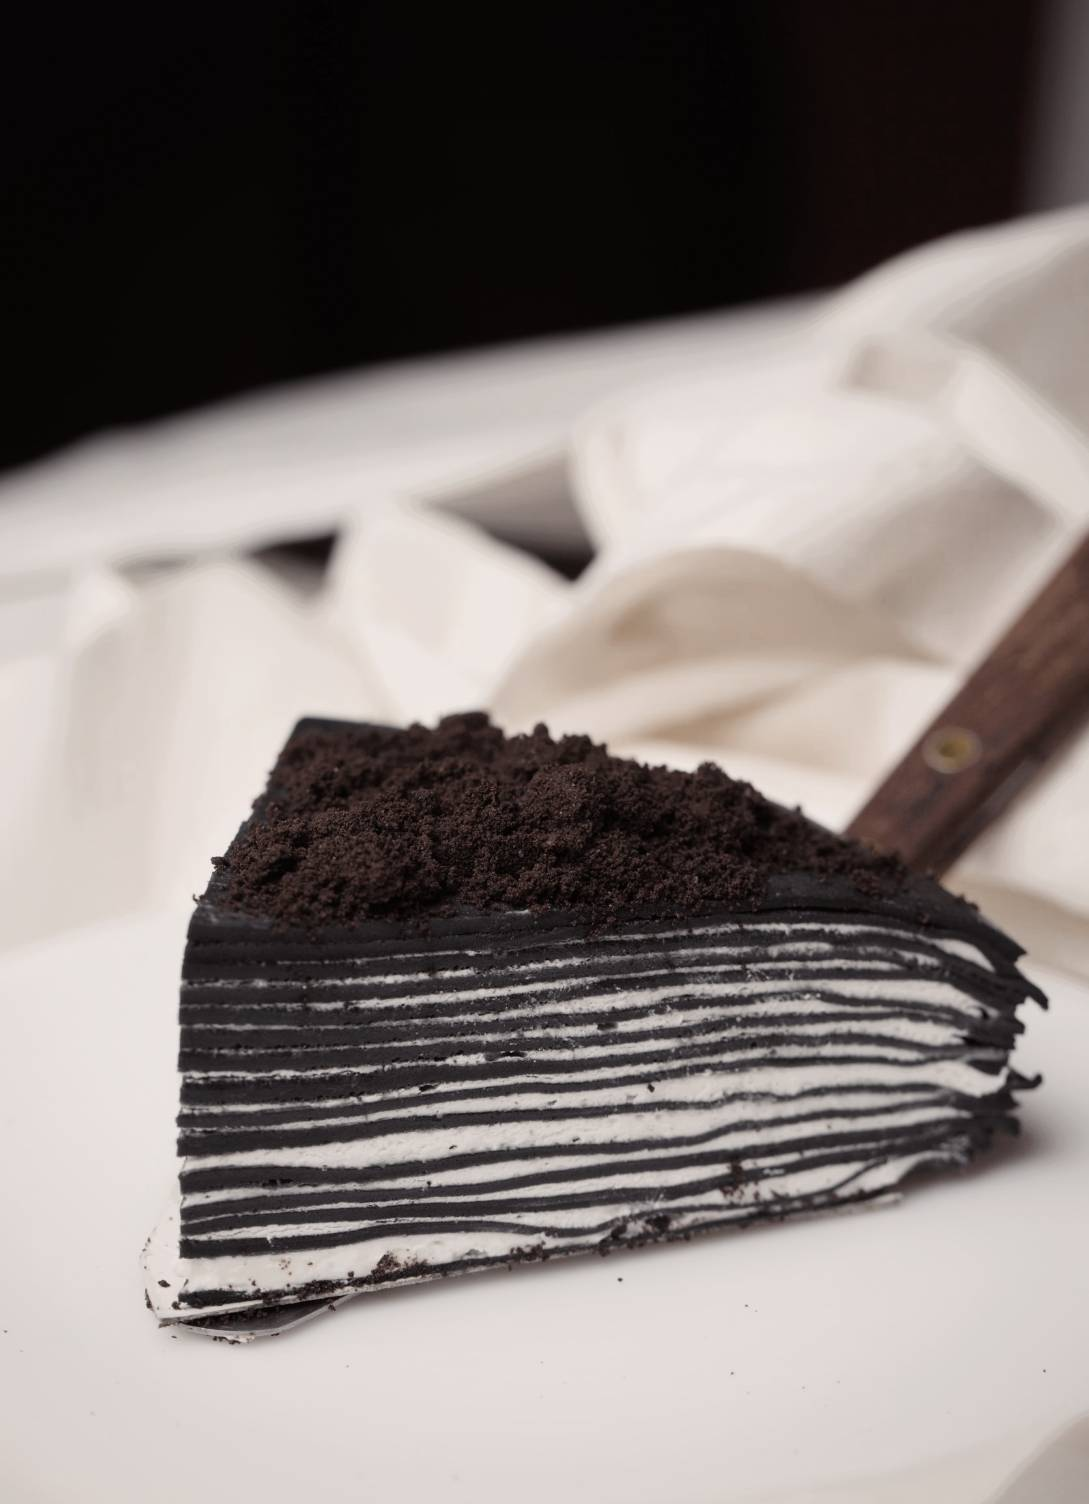 CHARCOALCREPECAKE - Better in BLACK